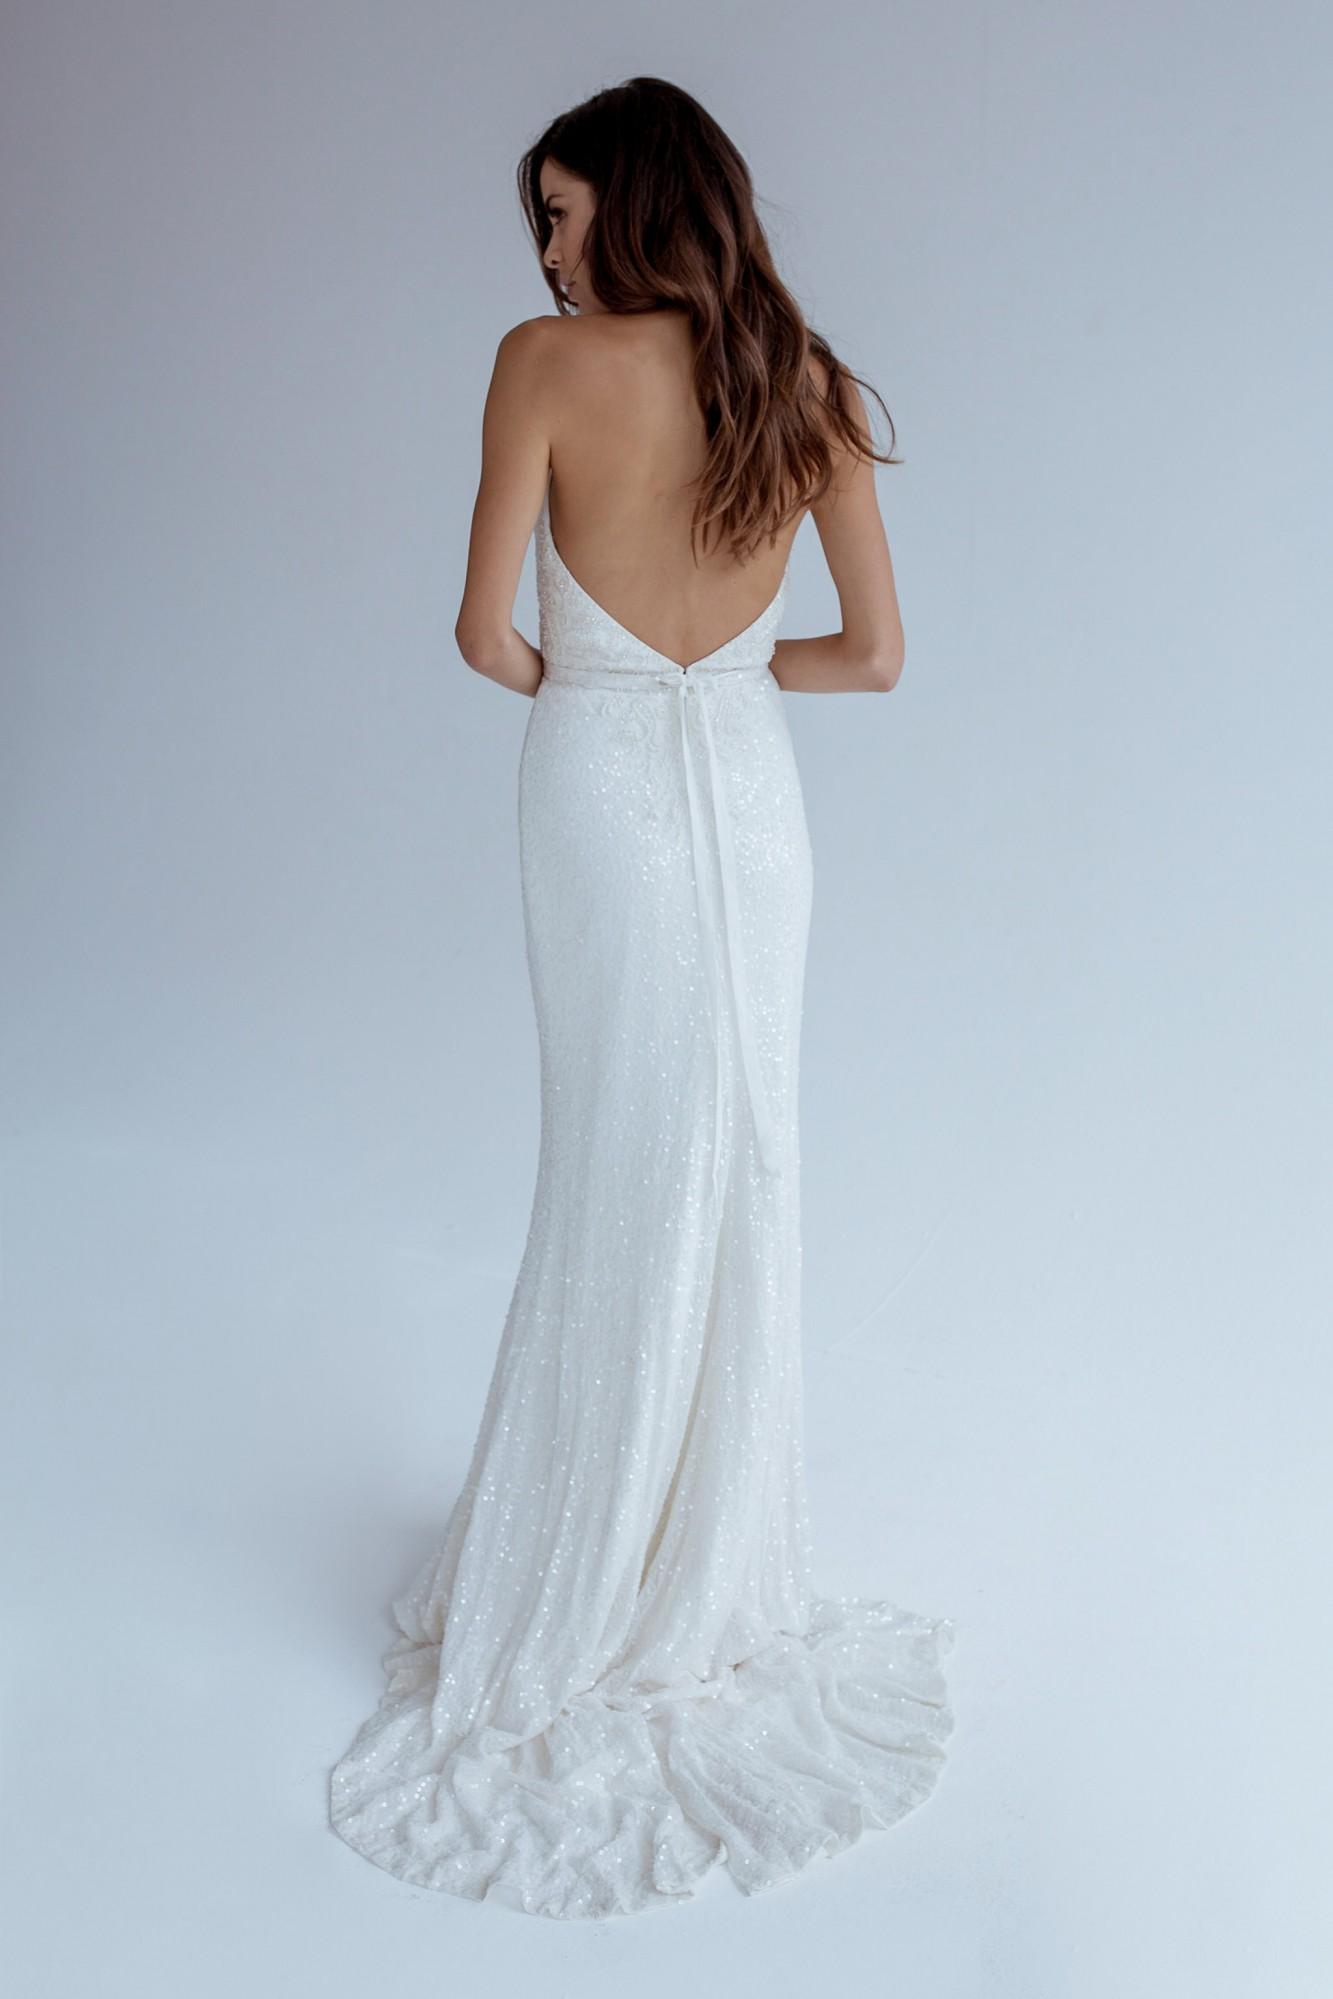 Karen Willis Holmes Nerada with Genevieve Skirt - New Wedding ...